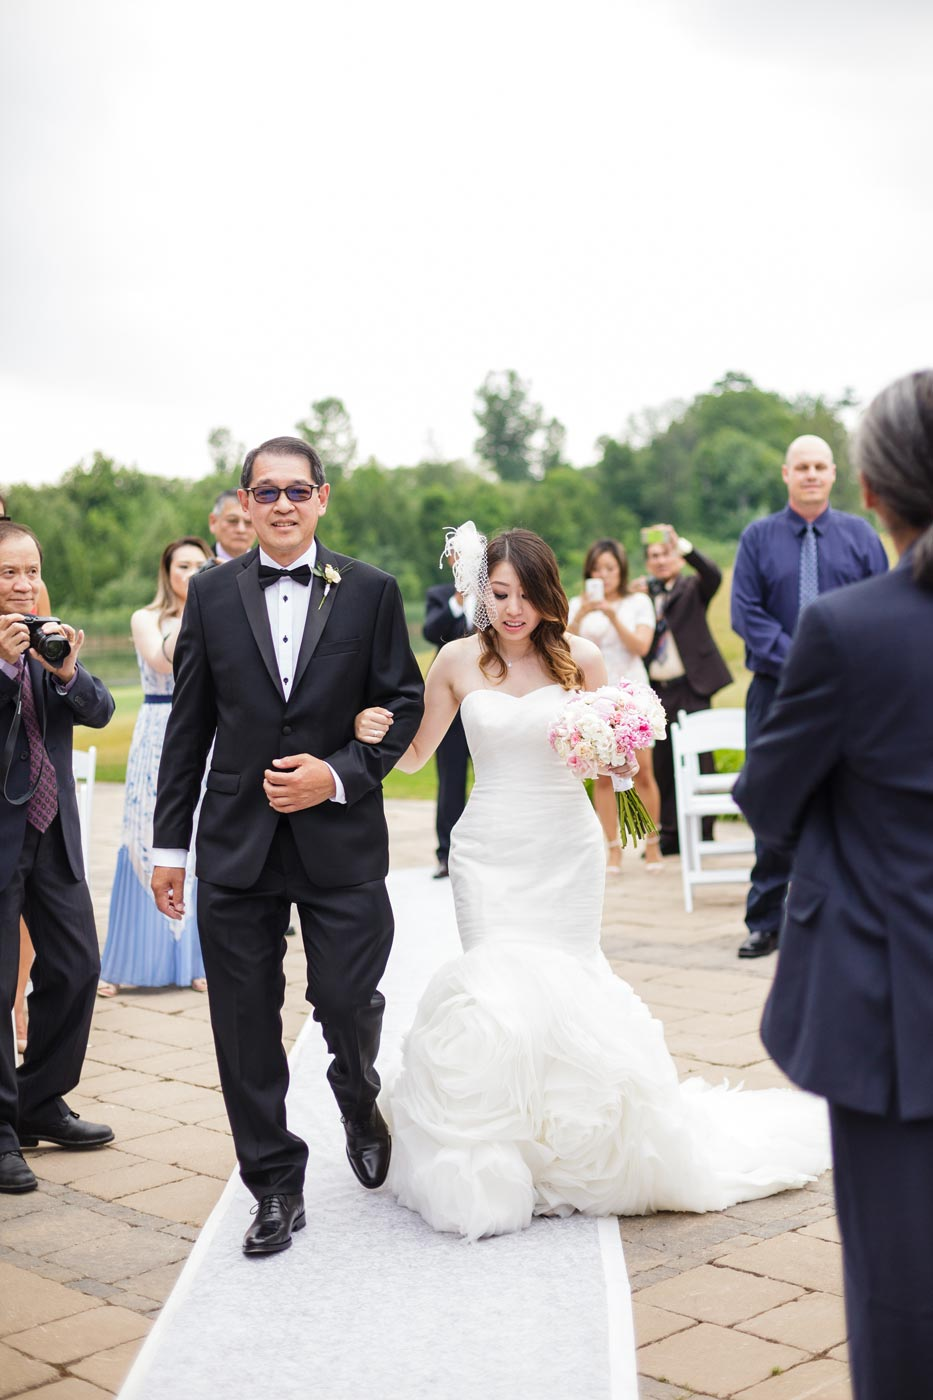 jessicahoang-savi-toronto-wedding-eagles-nest-33